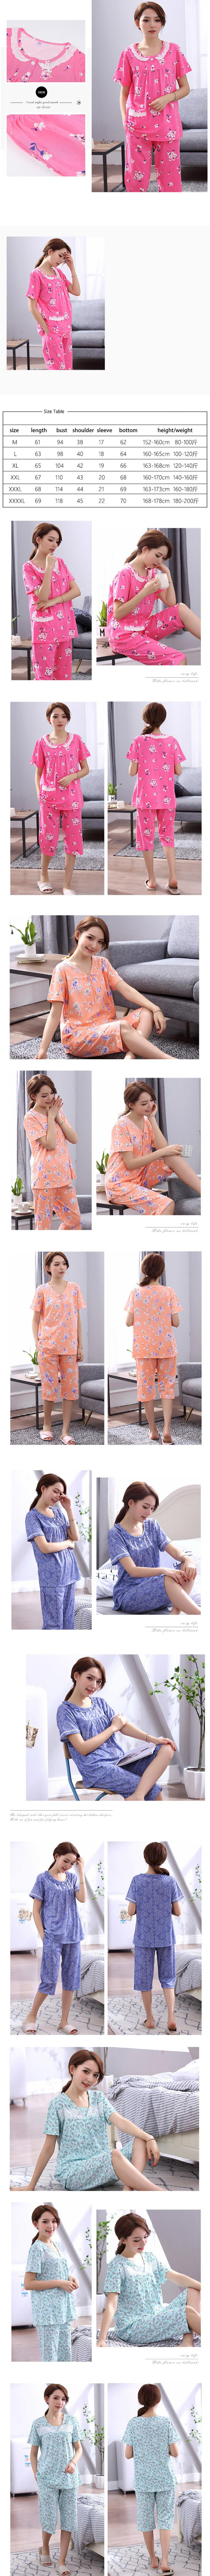 2-Piece Cotton Pajamas, Short Sleeve Pullover Women Tops T